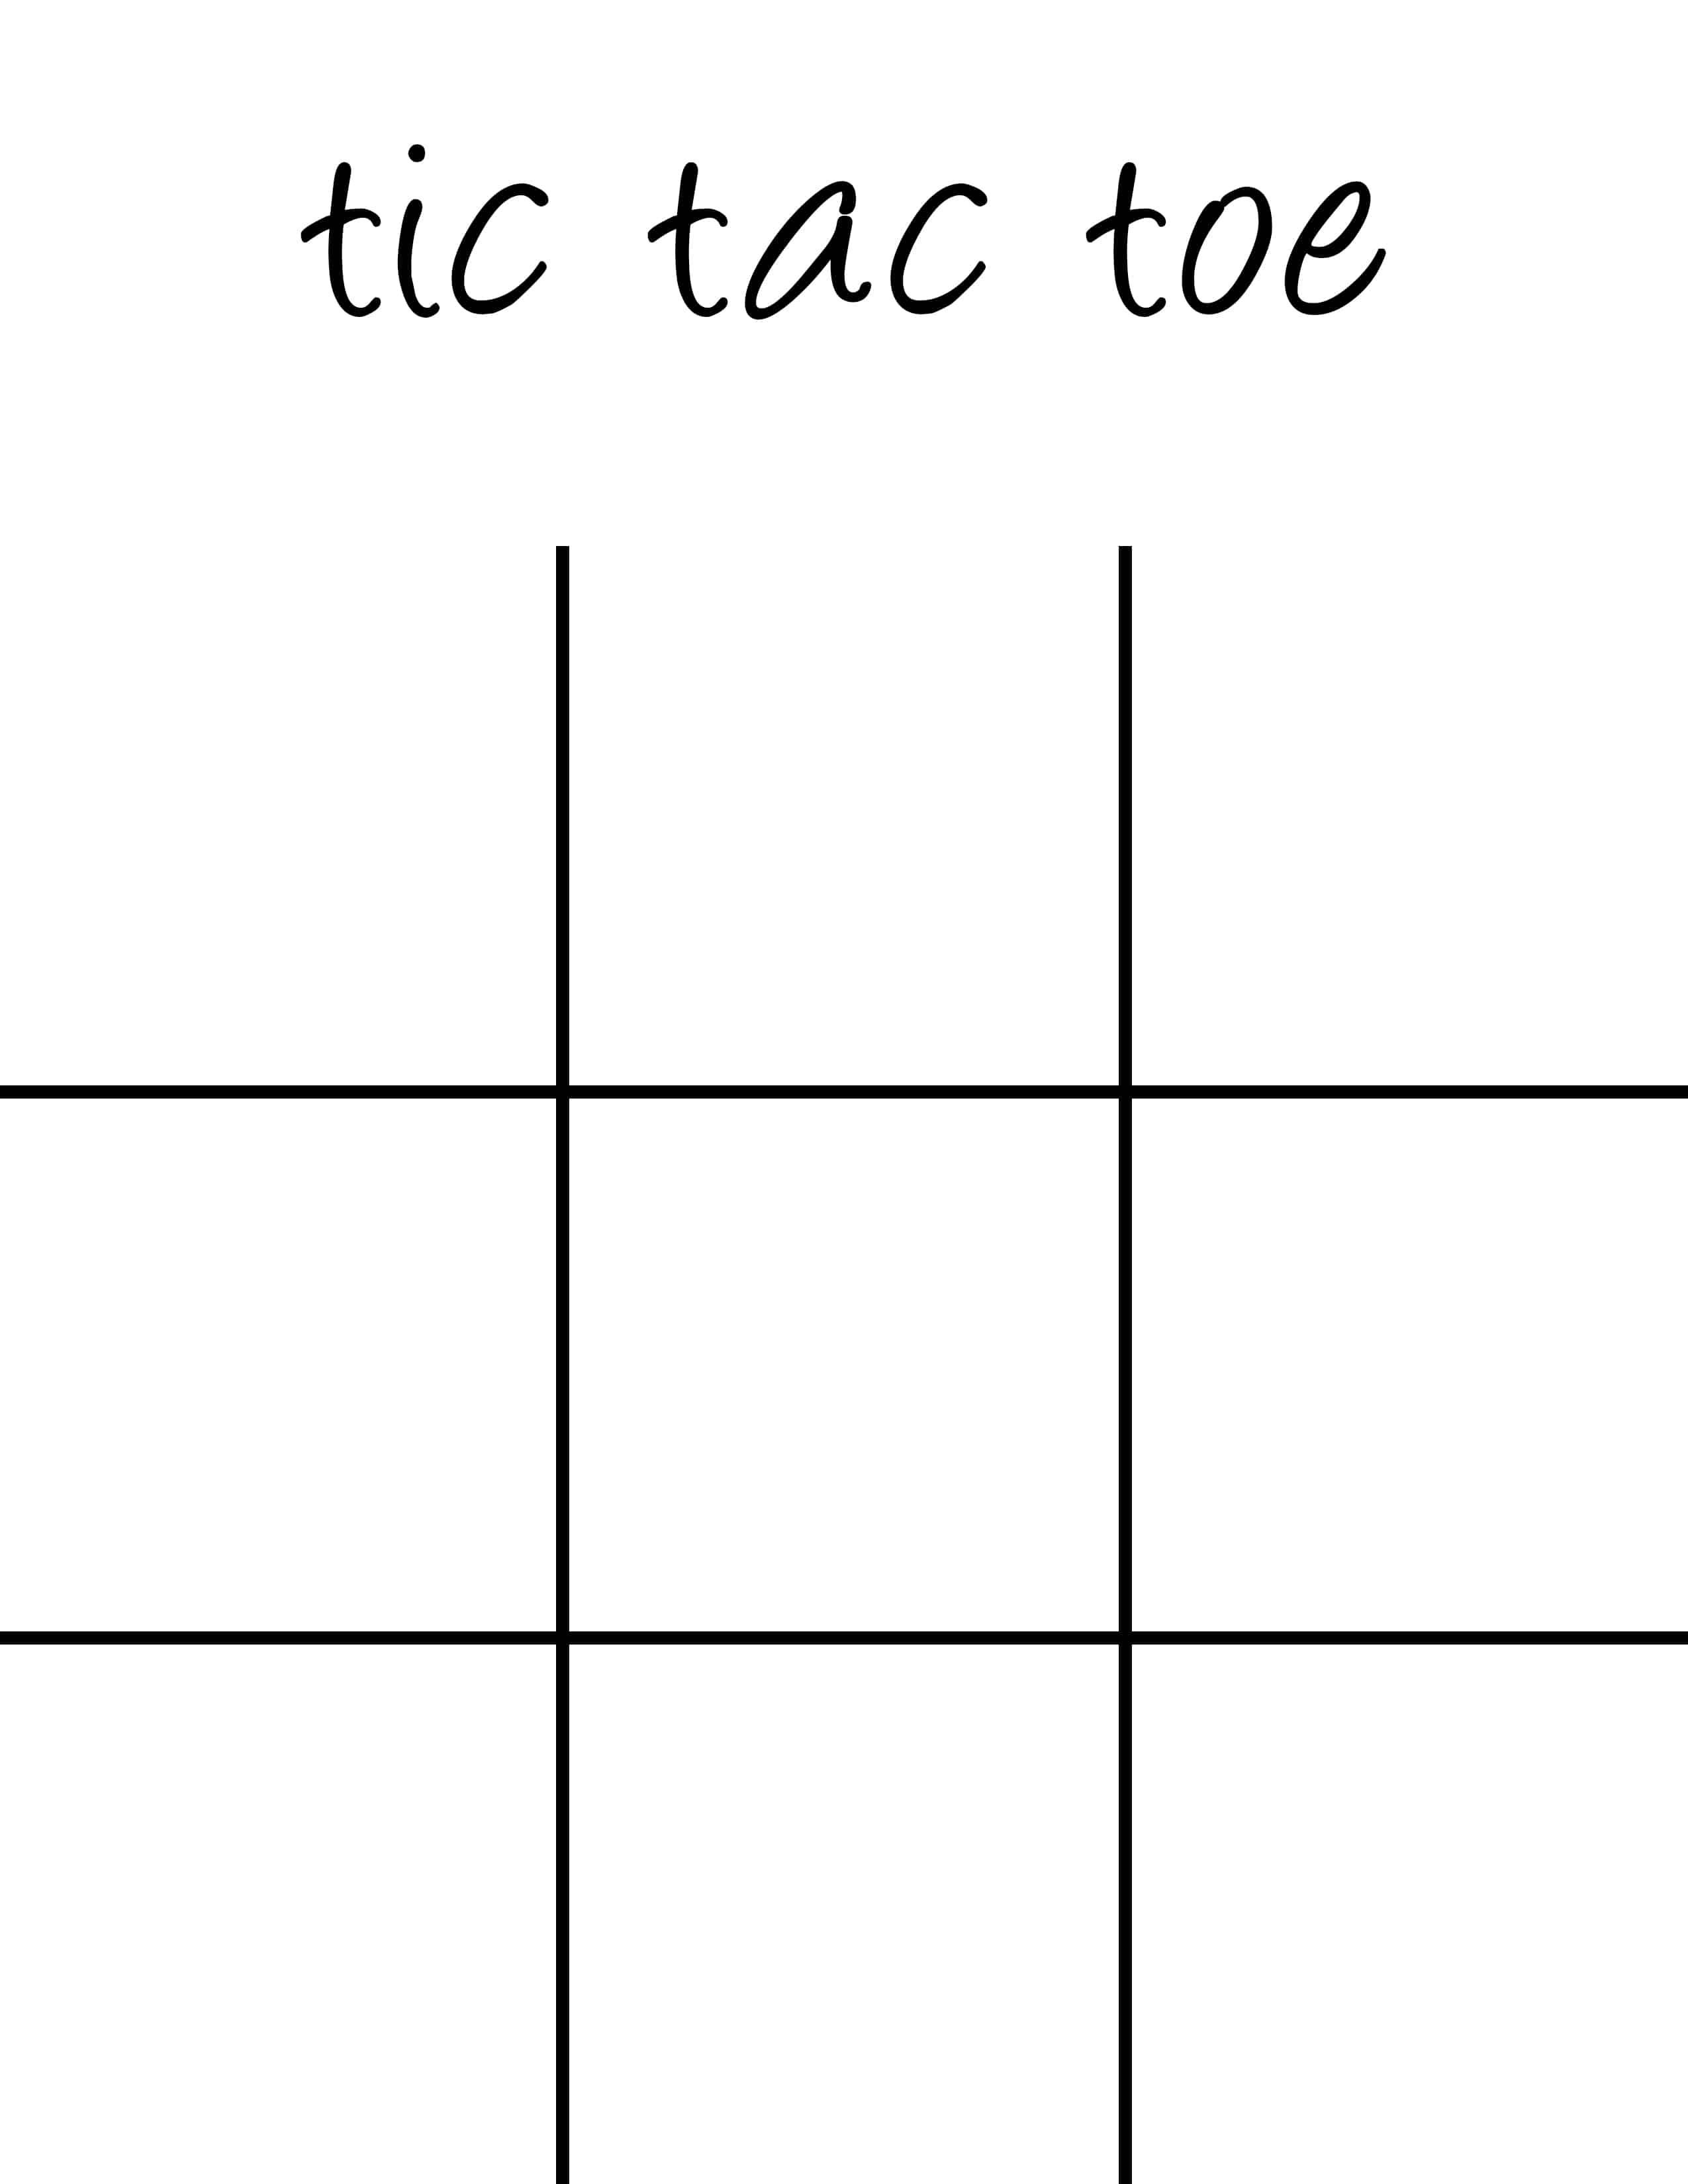 image regarding Tic Tac Toe Printable identify Tic Tac Toe Board Printable - 5 Minutes for Mother